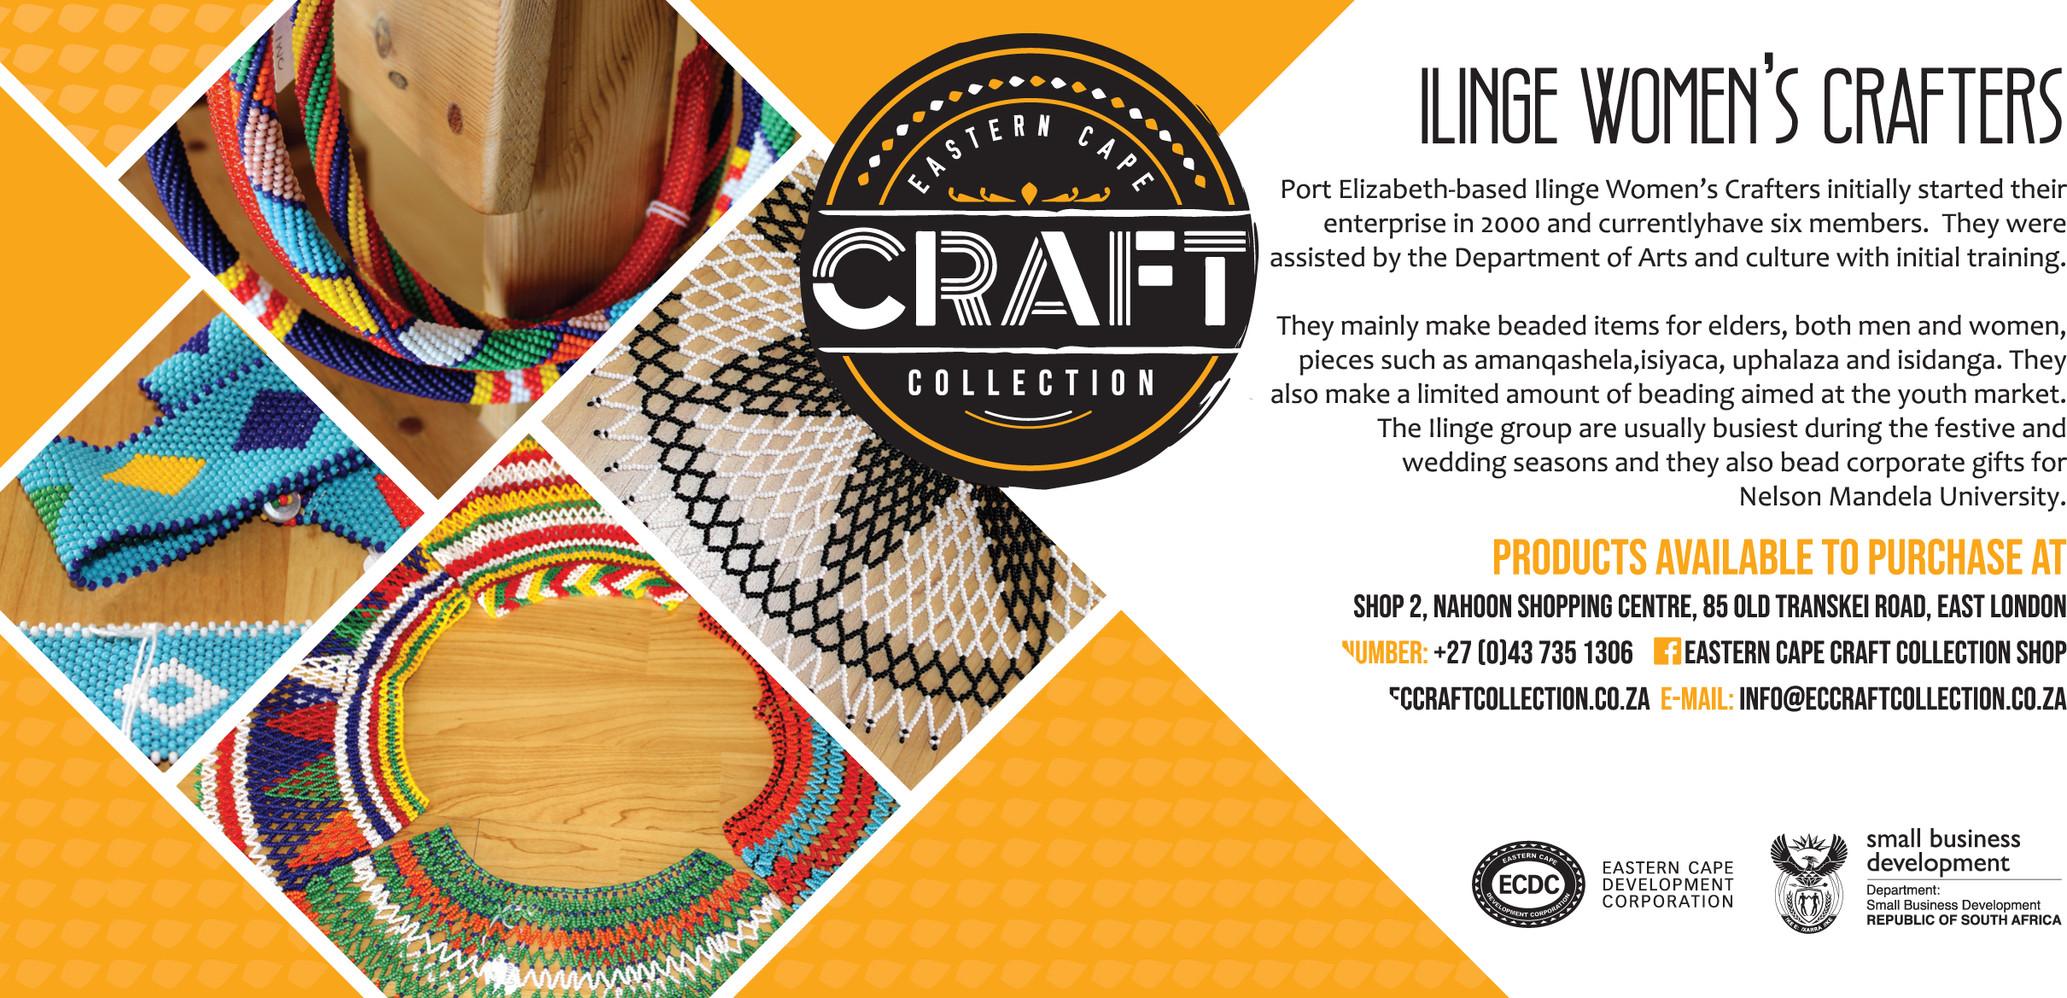 Ilinge Women's Crafters